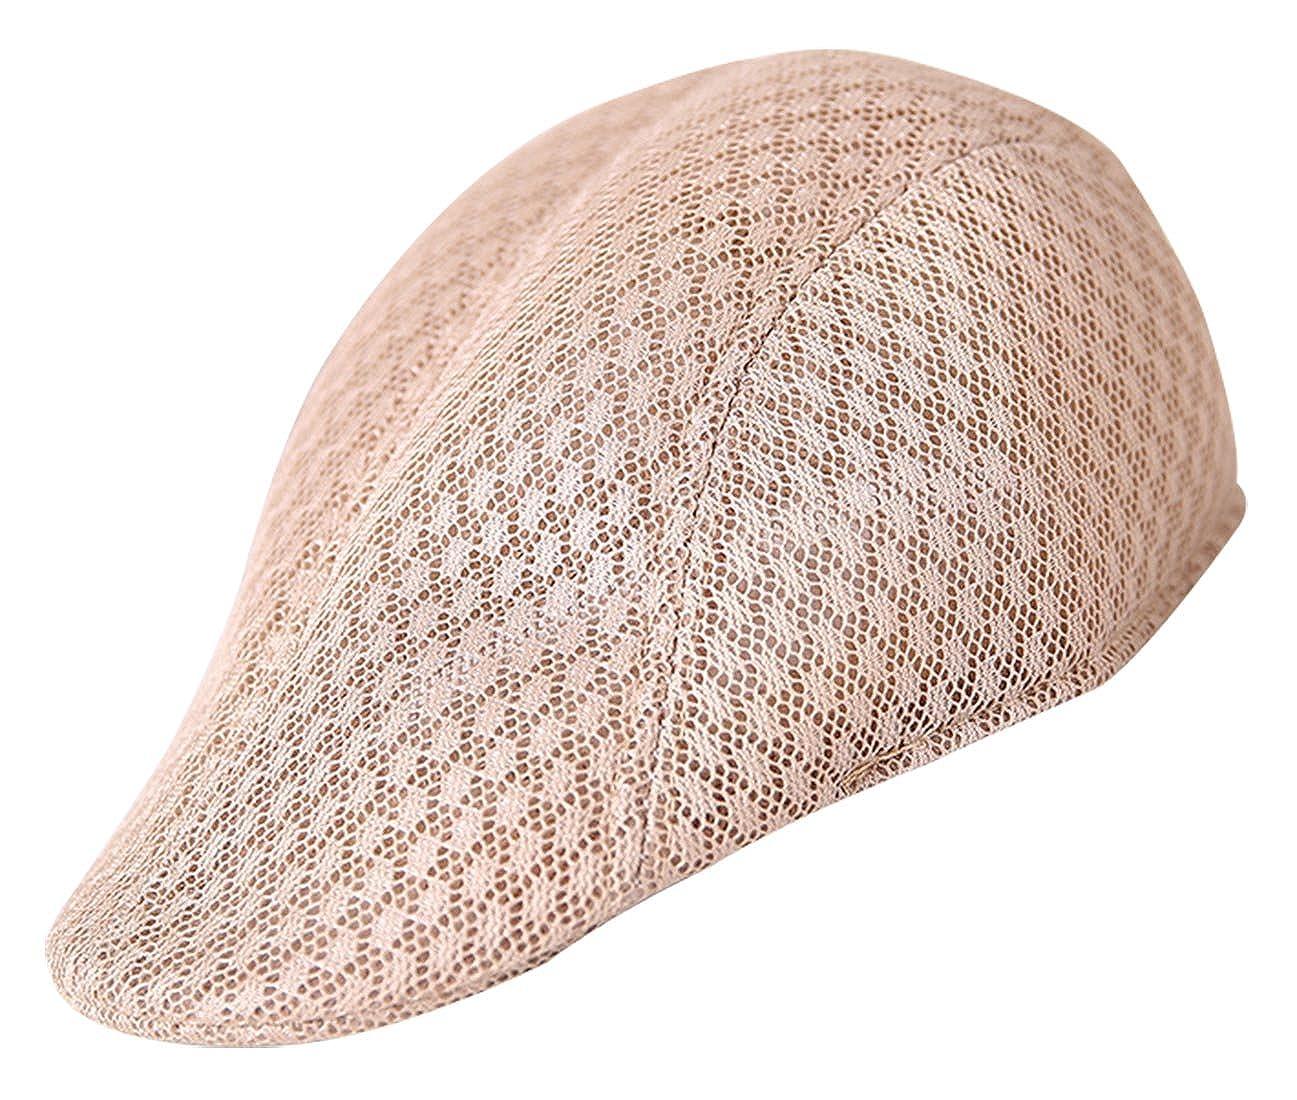 AIEOE Men Flat Cap Breathable Lightweight Summer Beret Walking Hiking Meah Hat